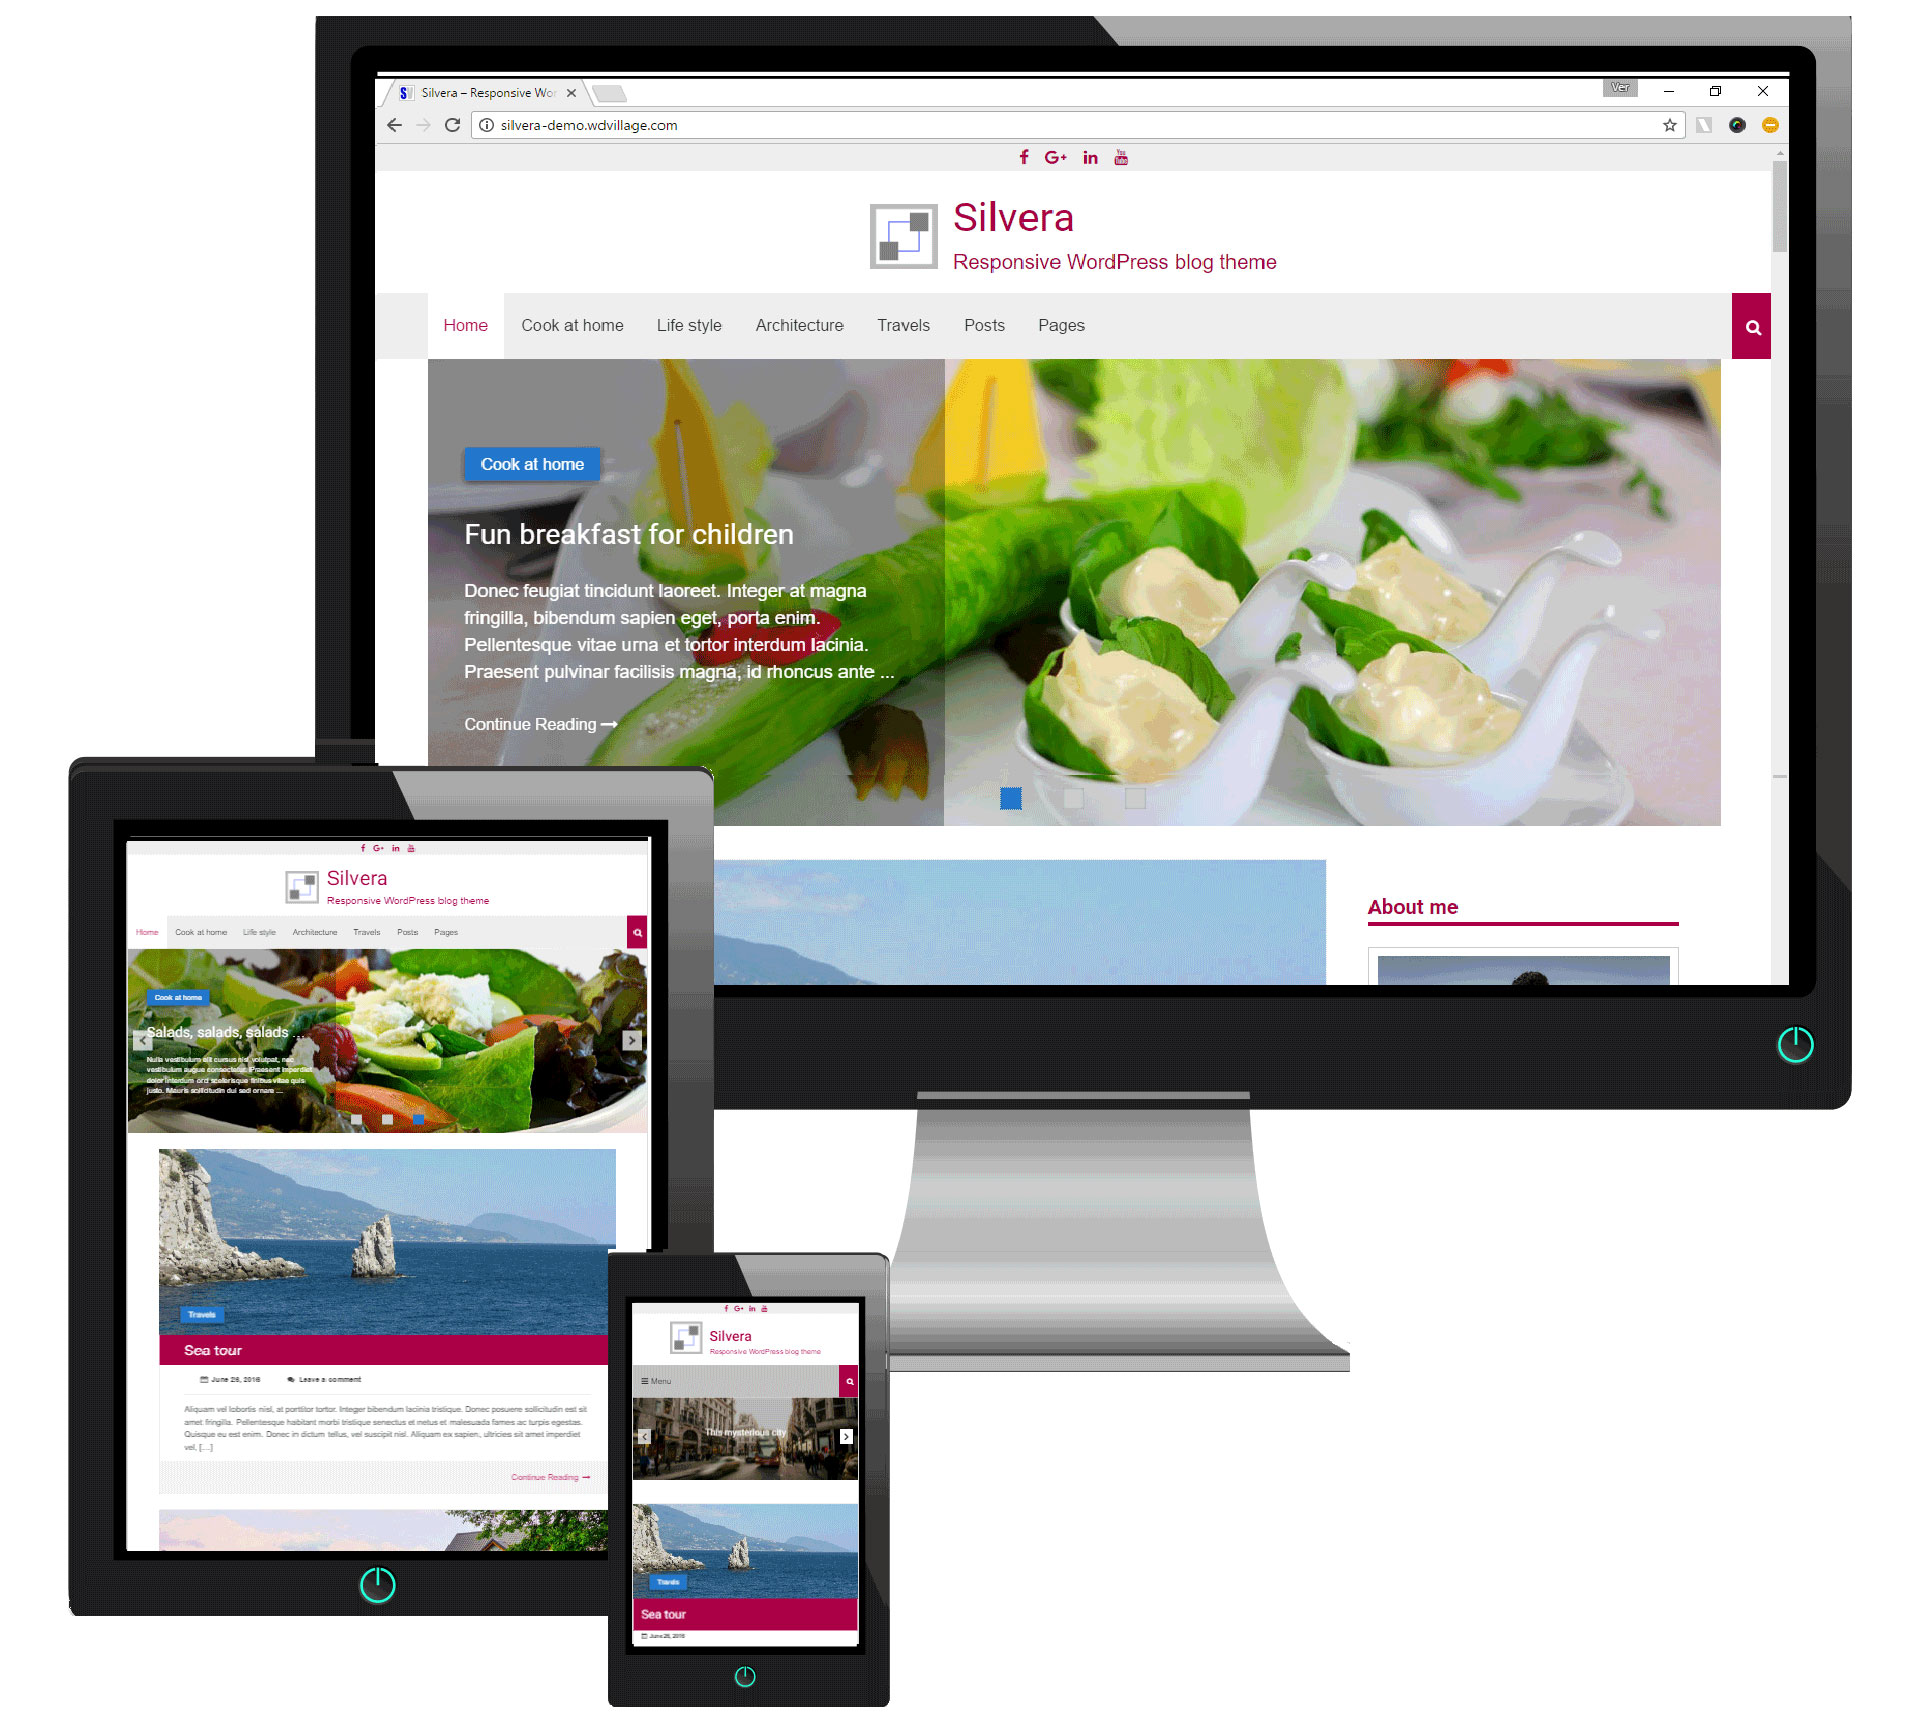 Silvera - Responsives WordPress-Blog-Theme - 1